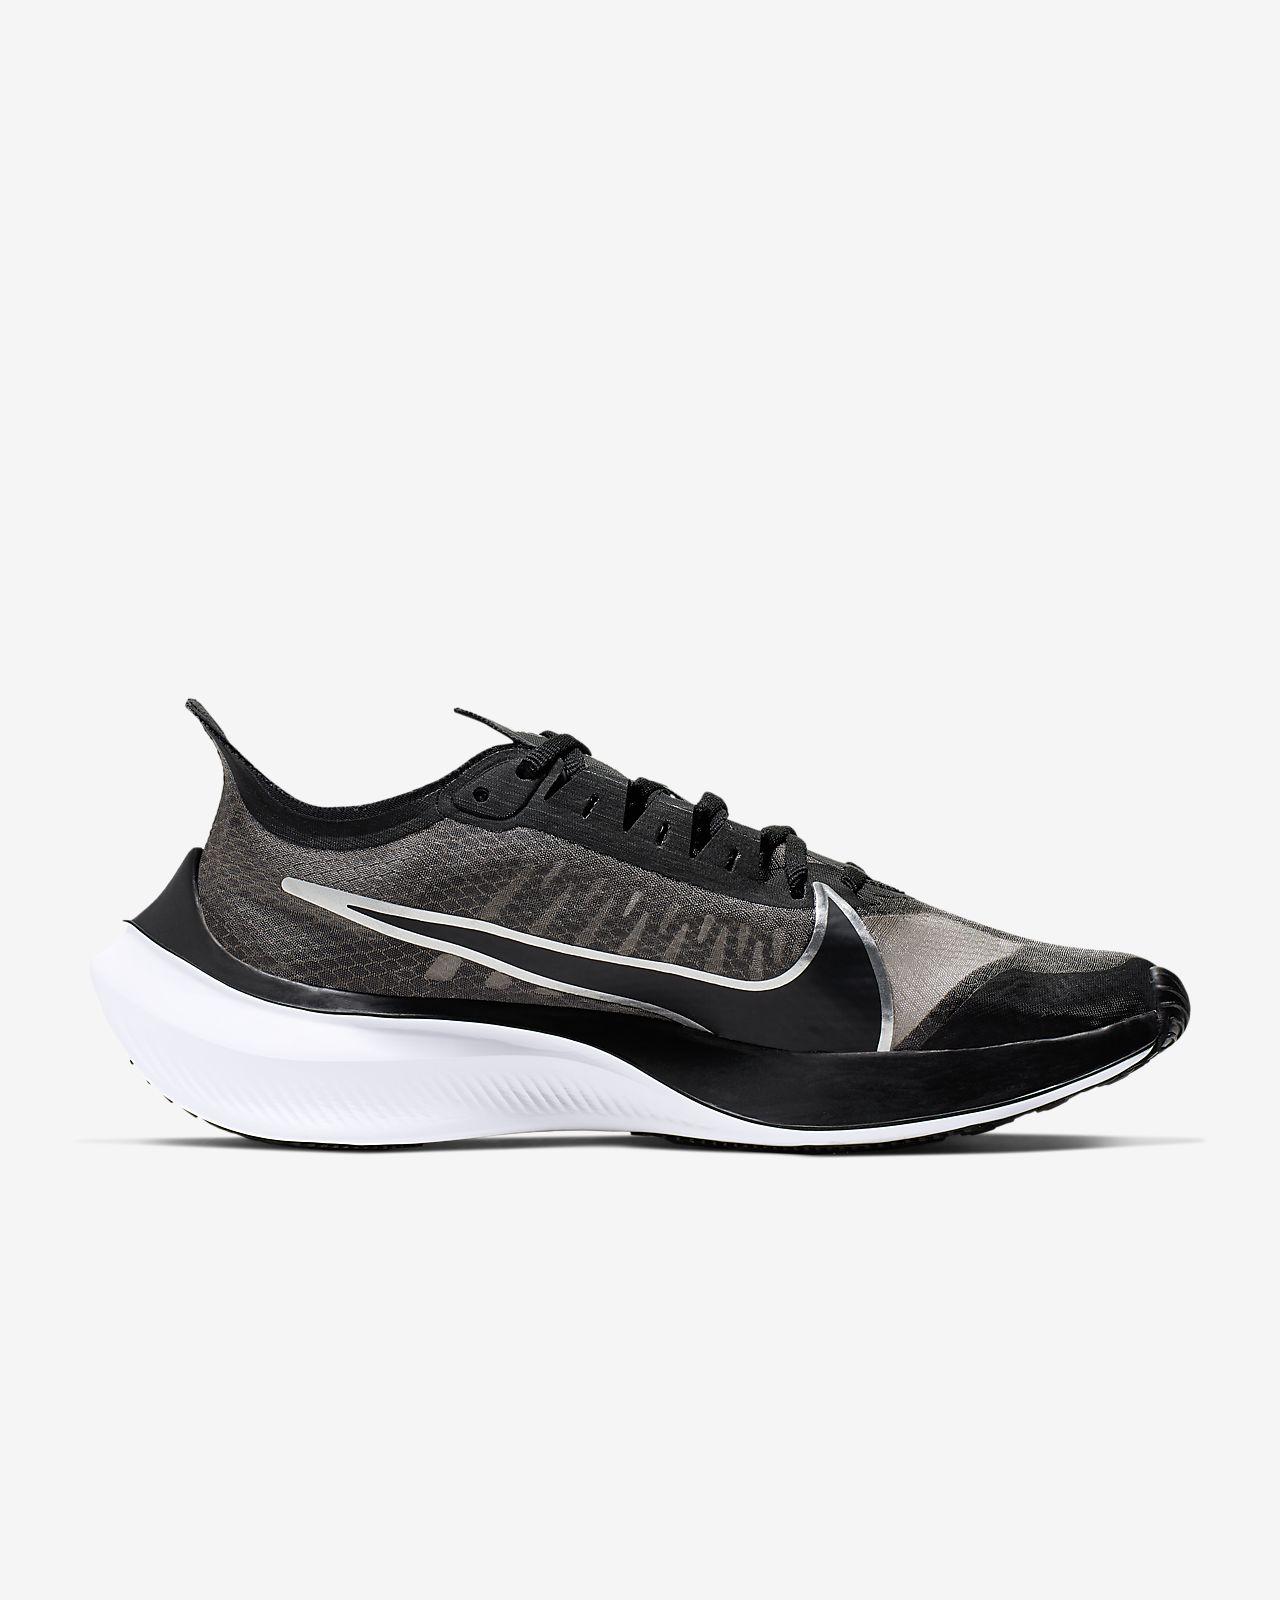 Nike Zoom Gravity Zapatillas de running Mujer